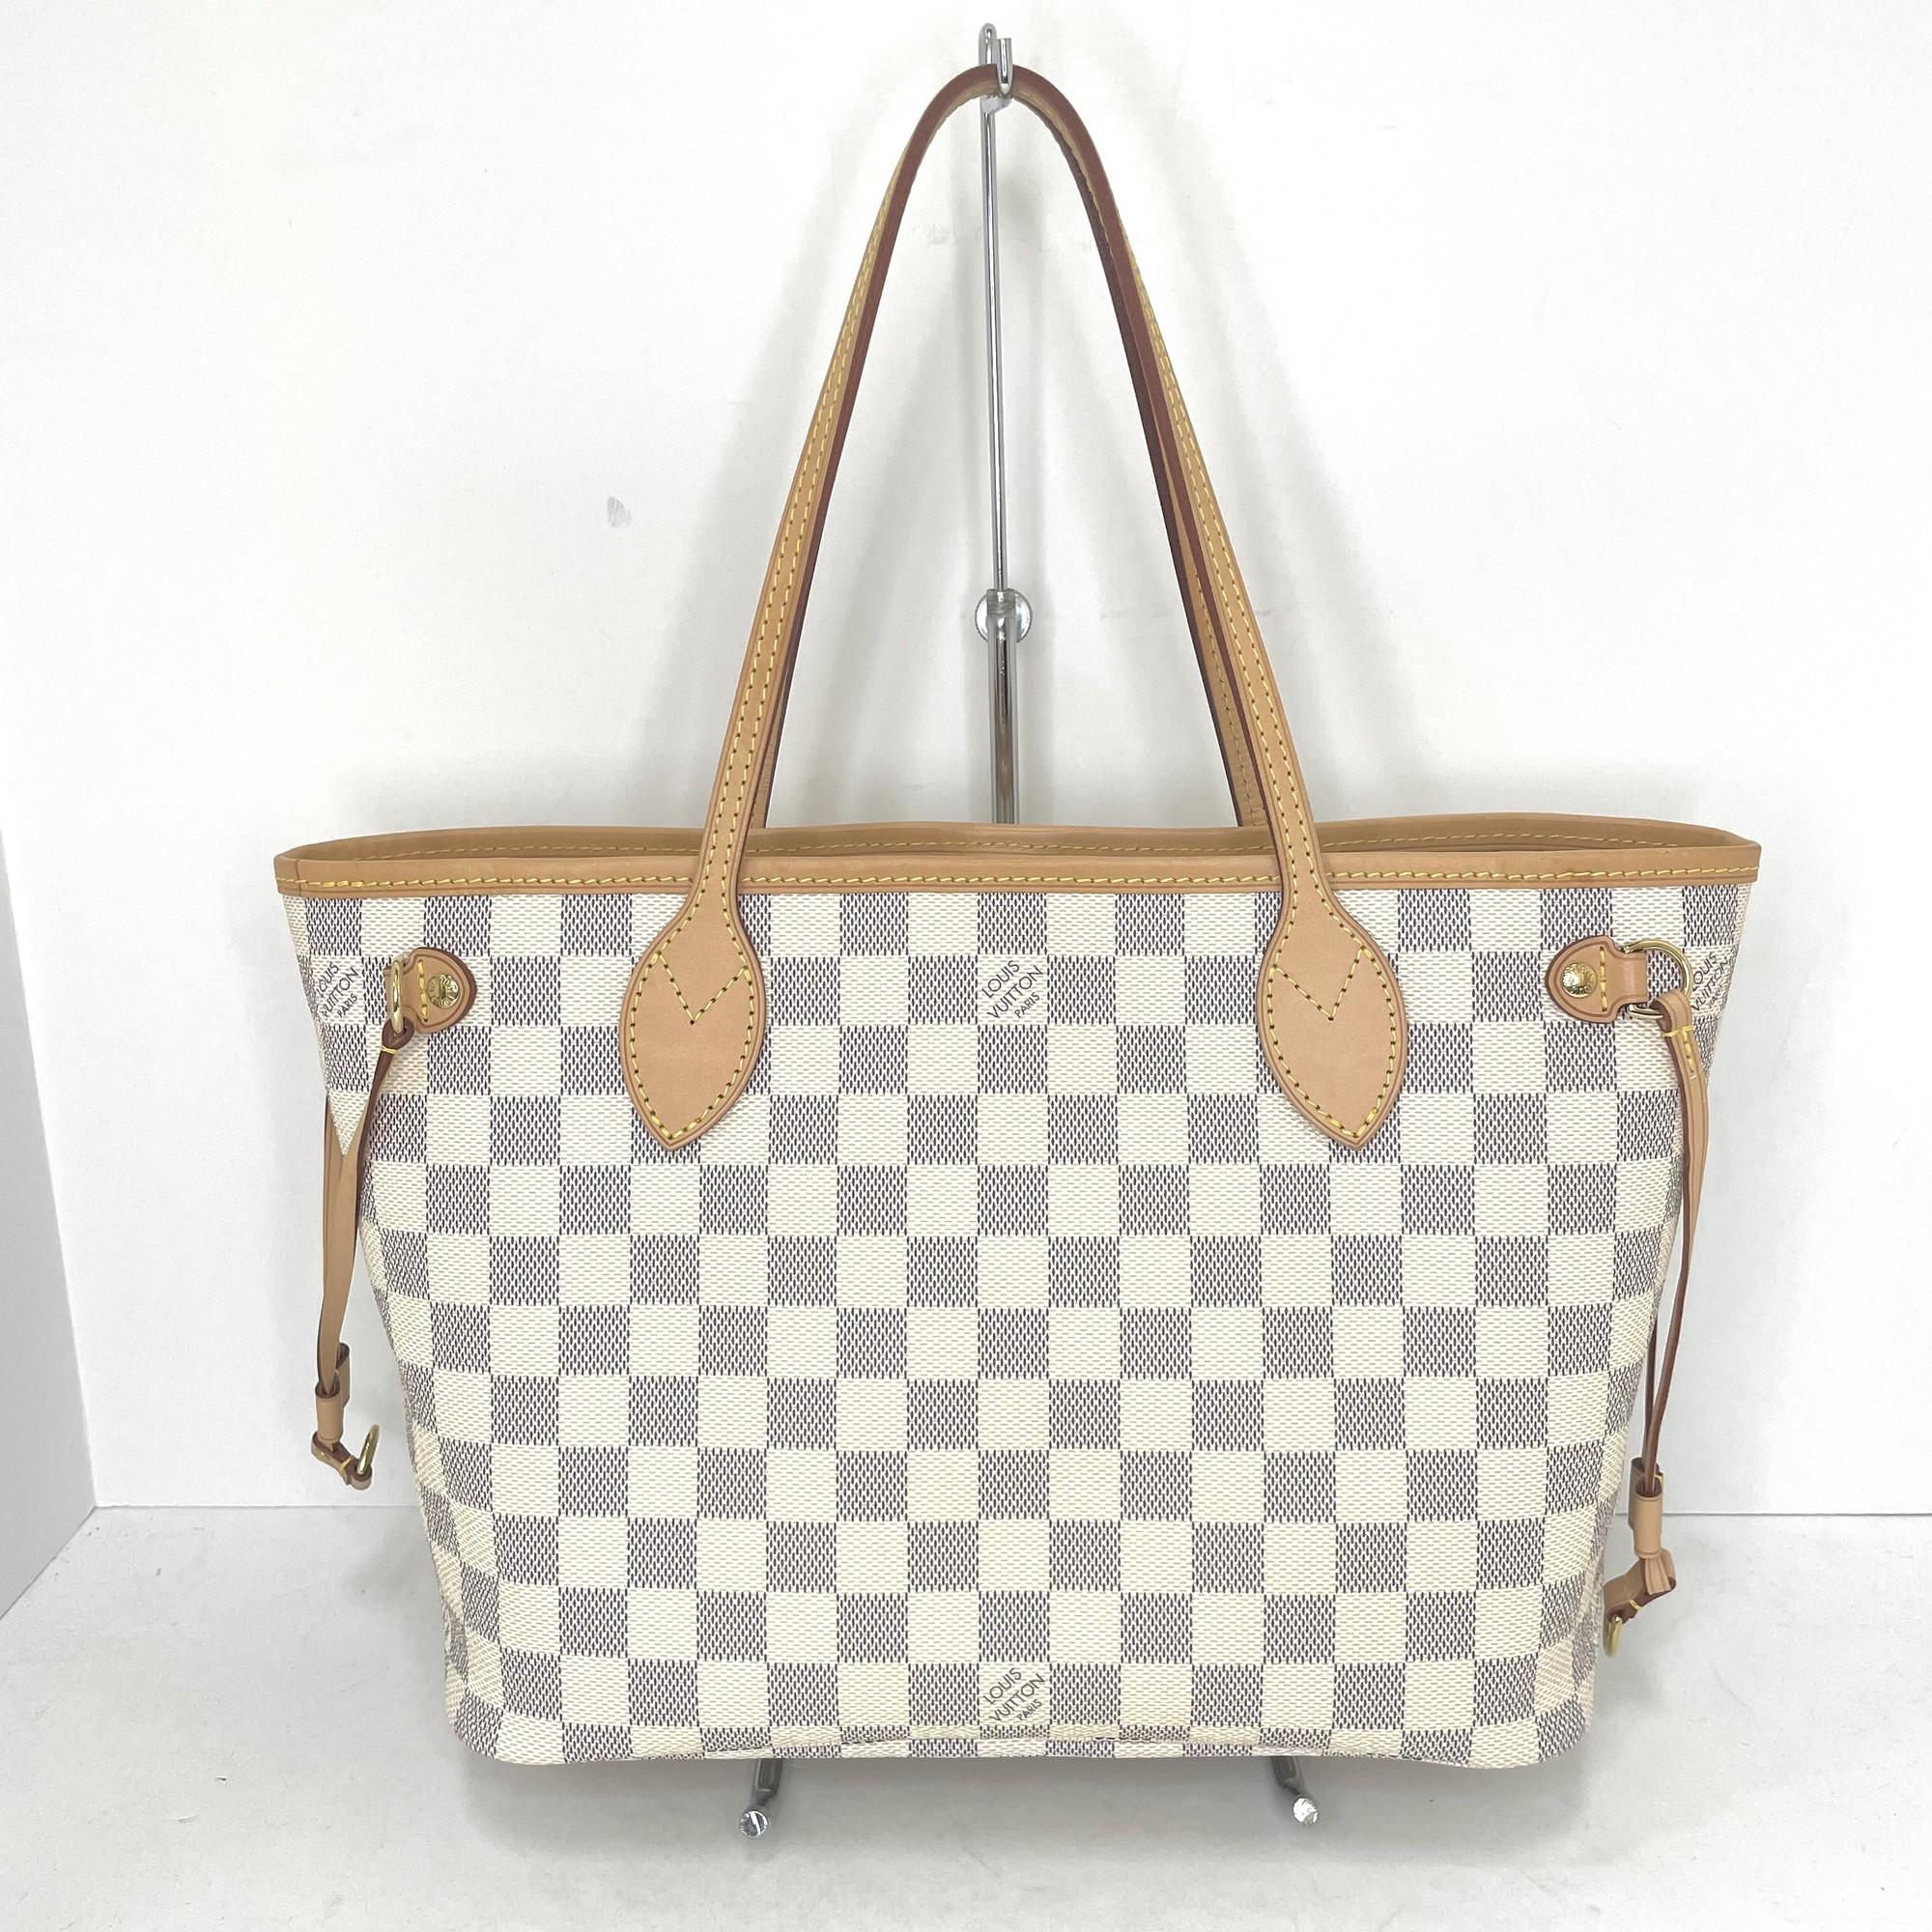 Louis Vuitton Neverful PM, $1199.99